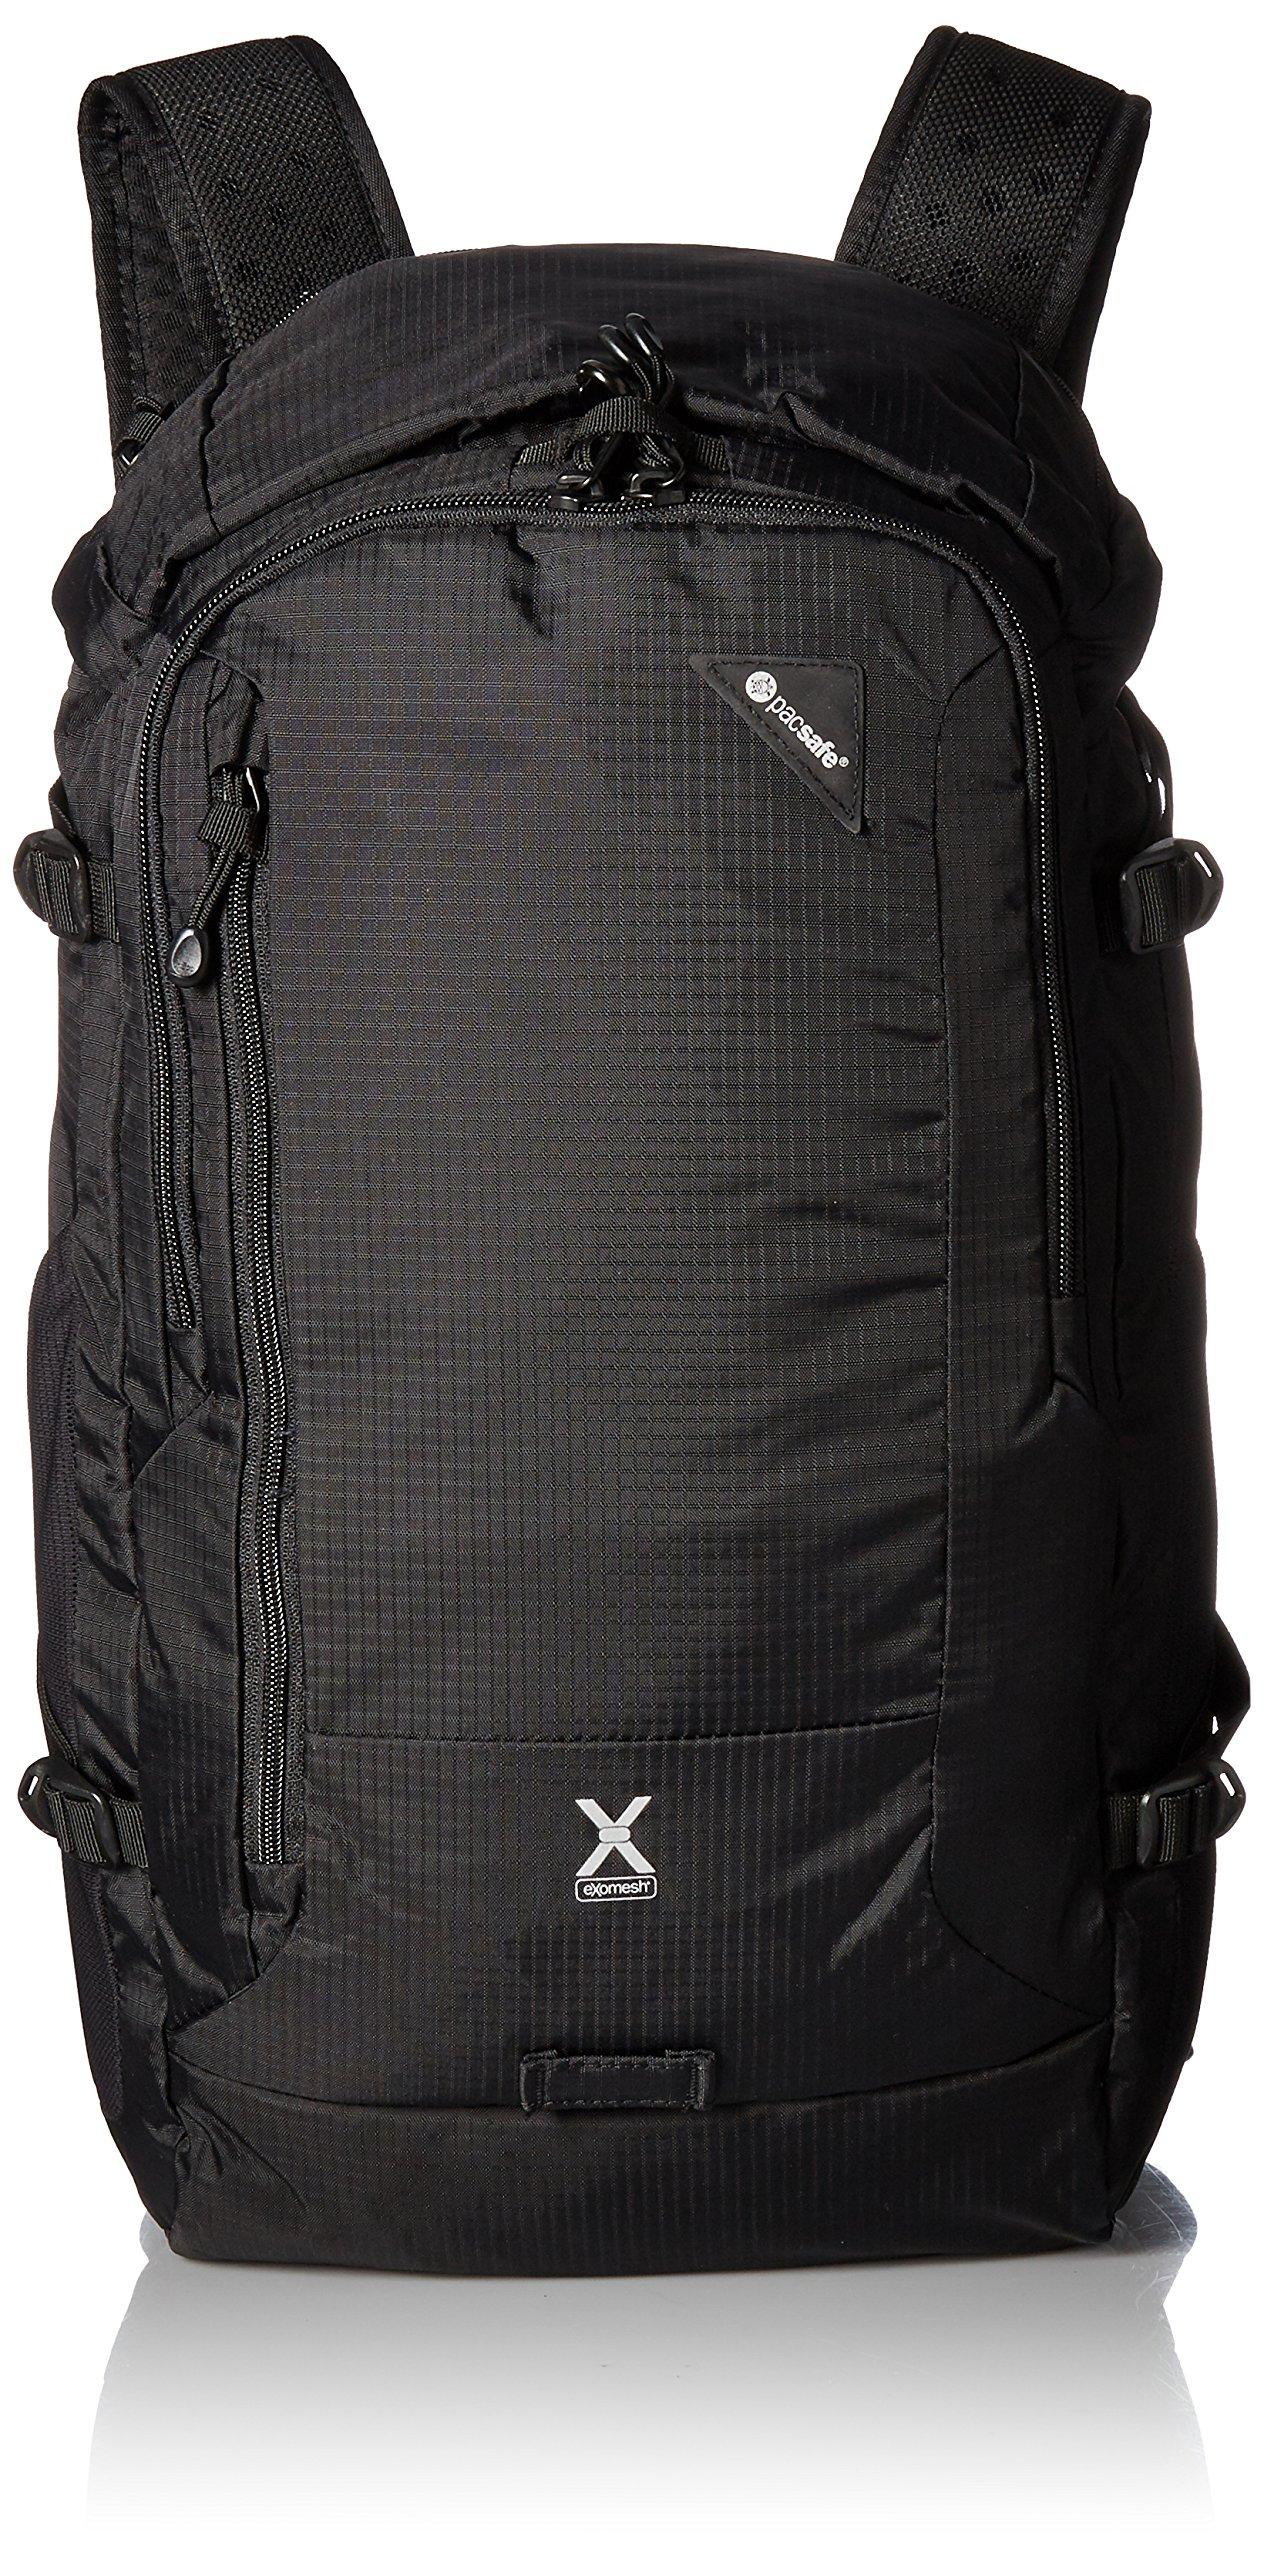 Pacsafe Venturesafe X30 Anti-Theft Adventure Backpack, Black by Pacsafe